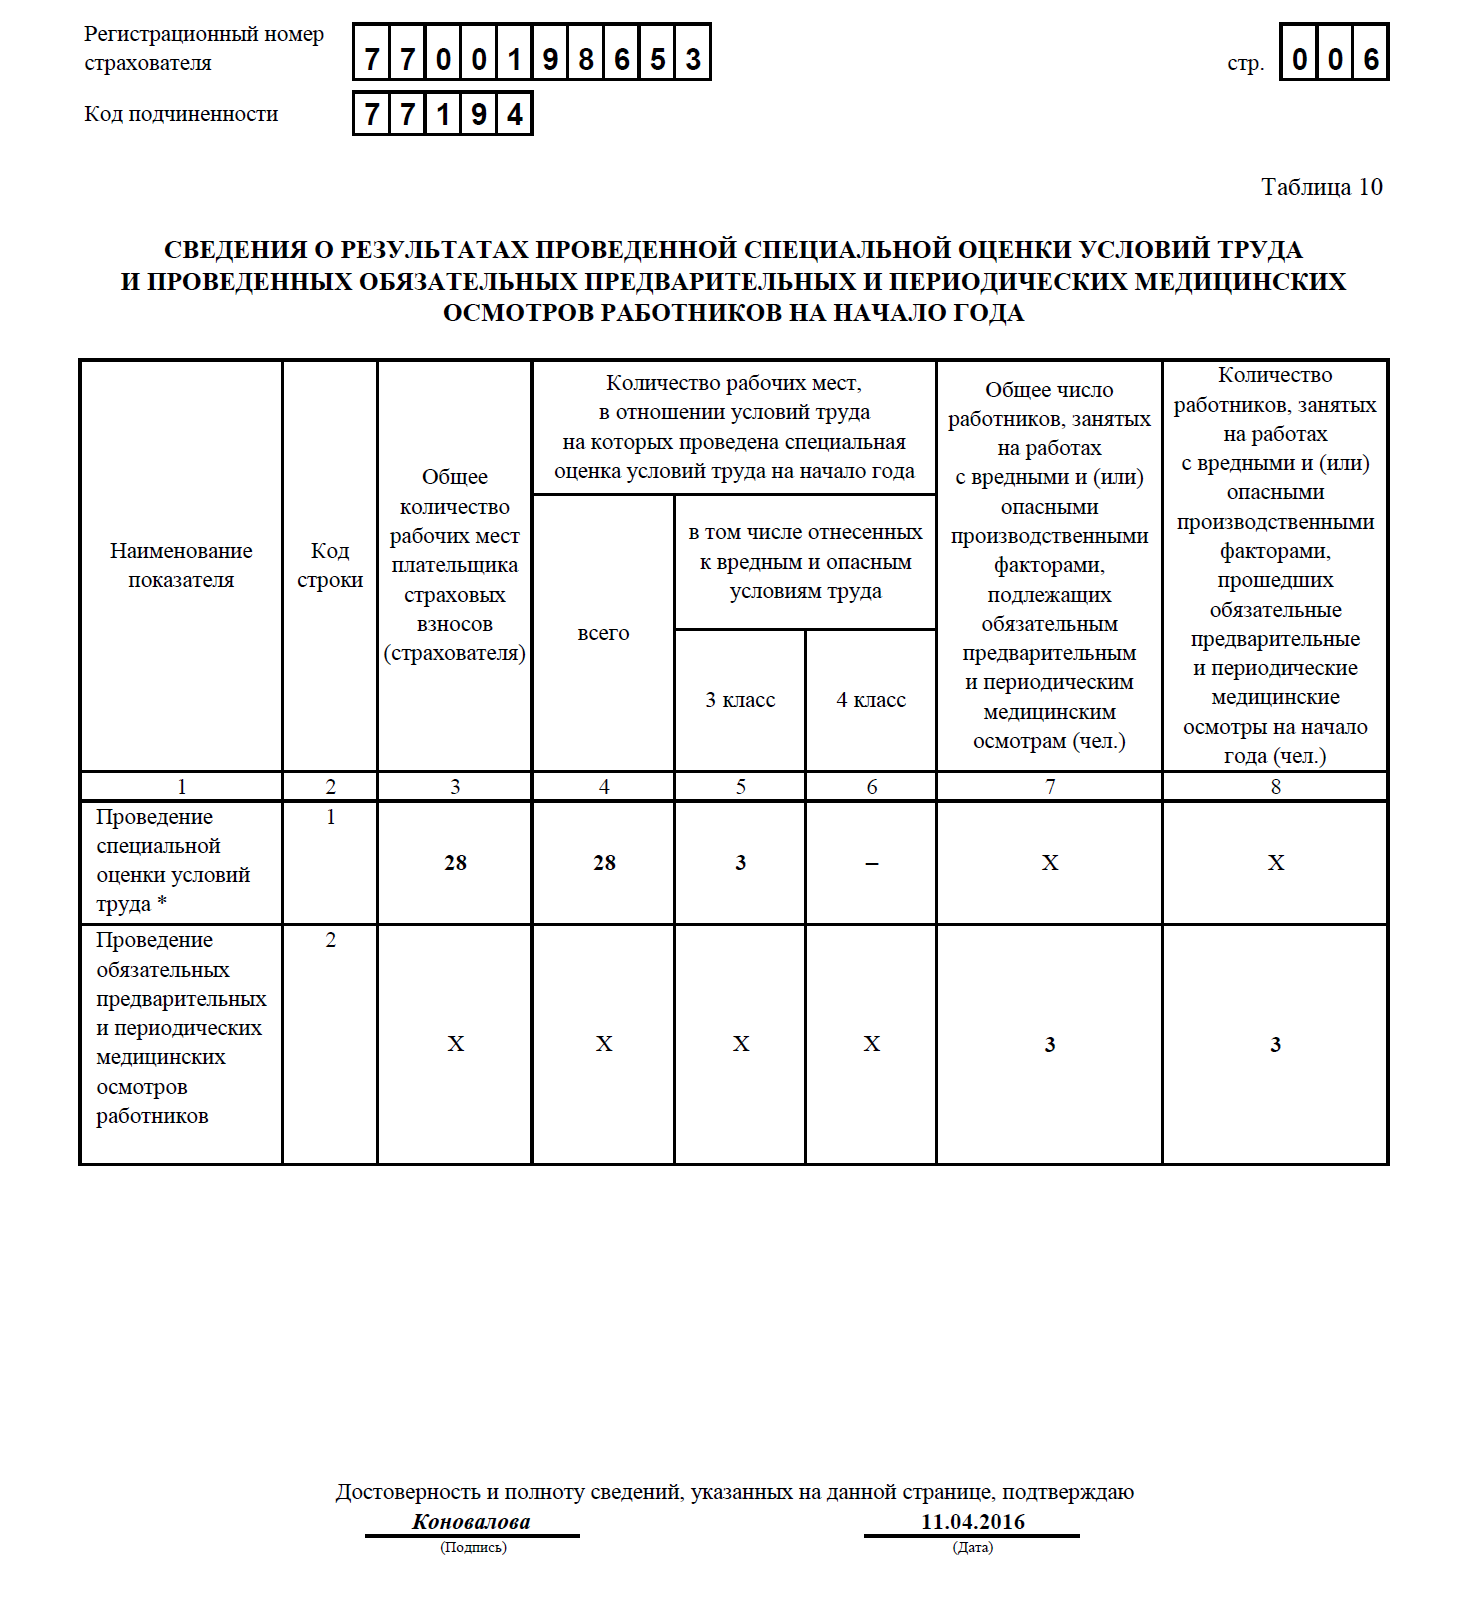 4 ФСС таблица 10: правила заполнения за 2 квартал 2016 года